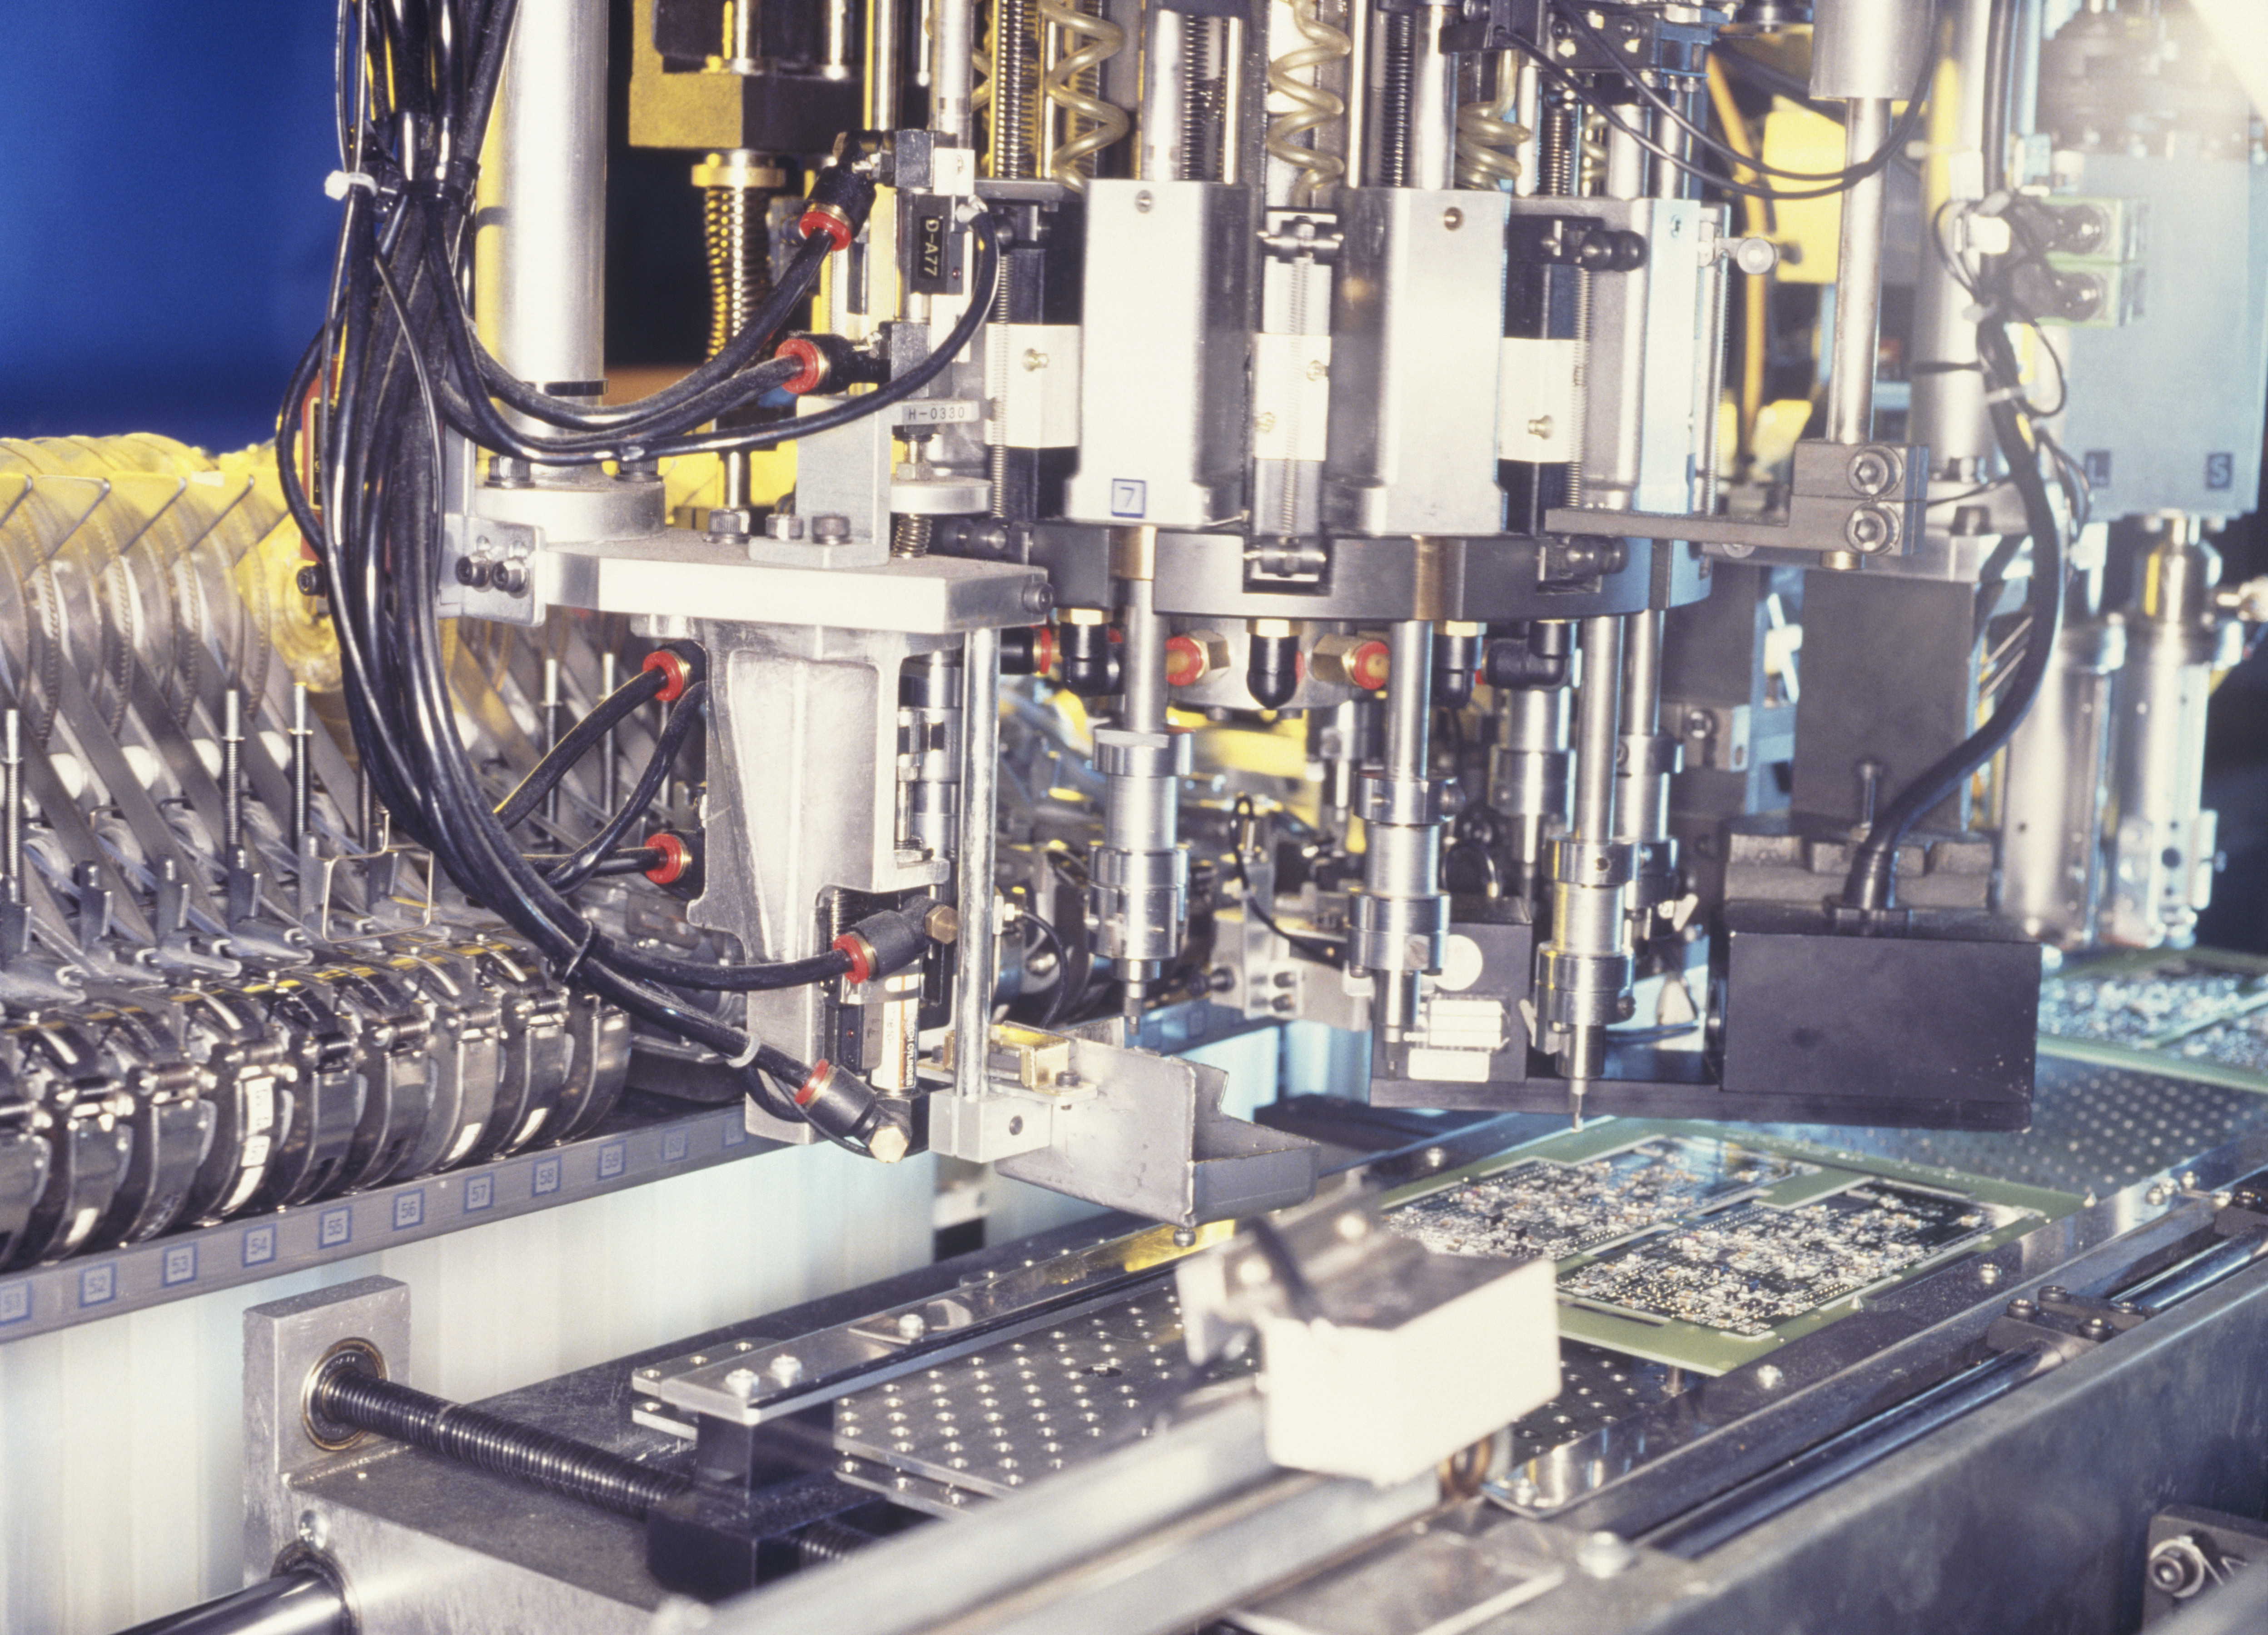 speedgoat enable the industrial machinery motion control development rh speedgoat com